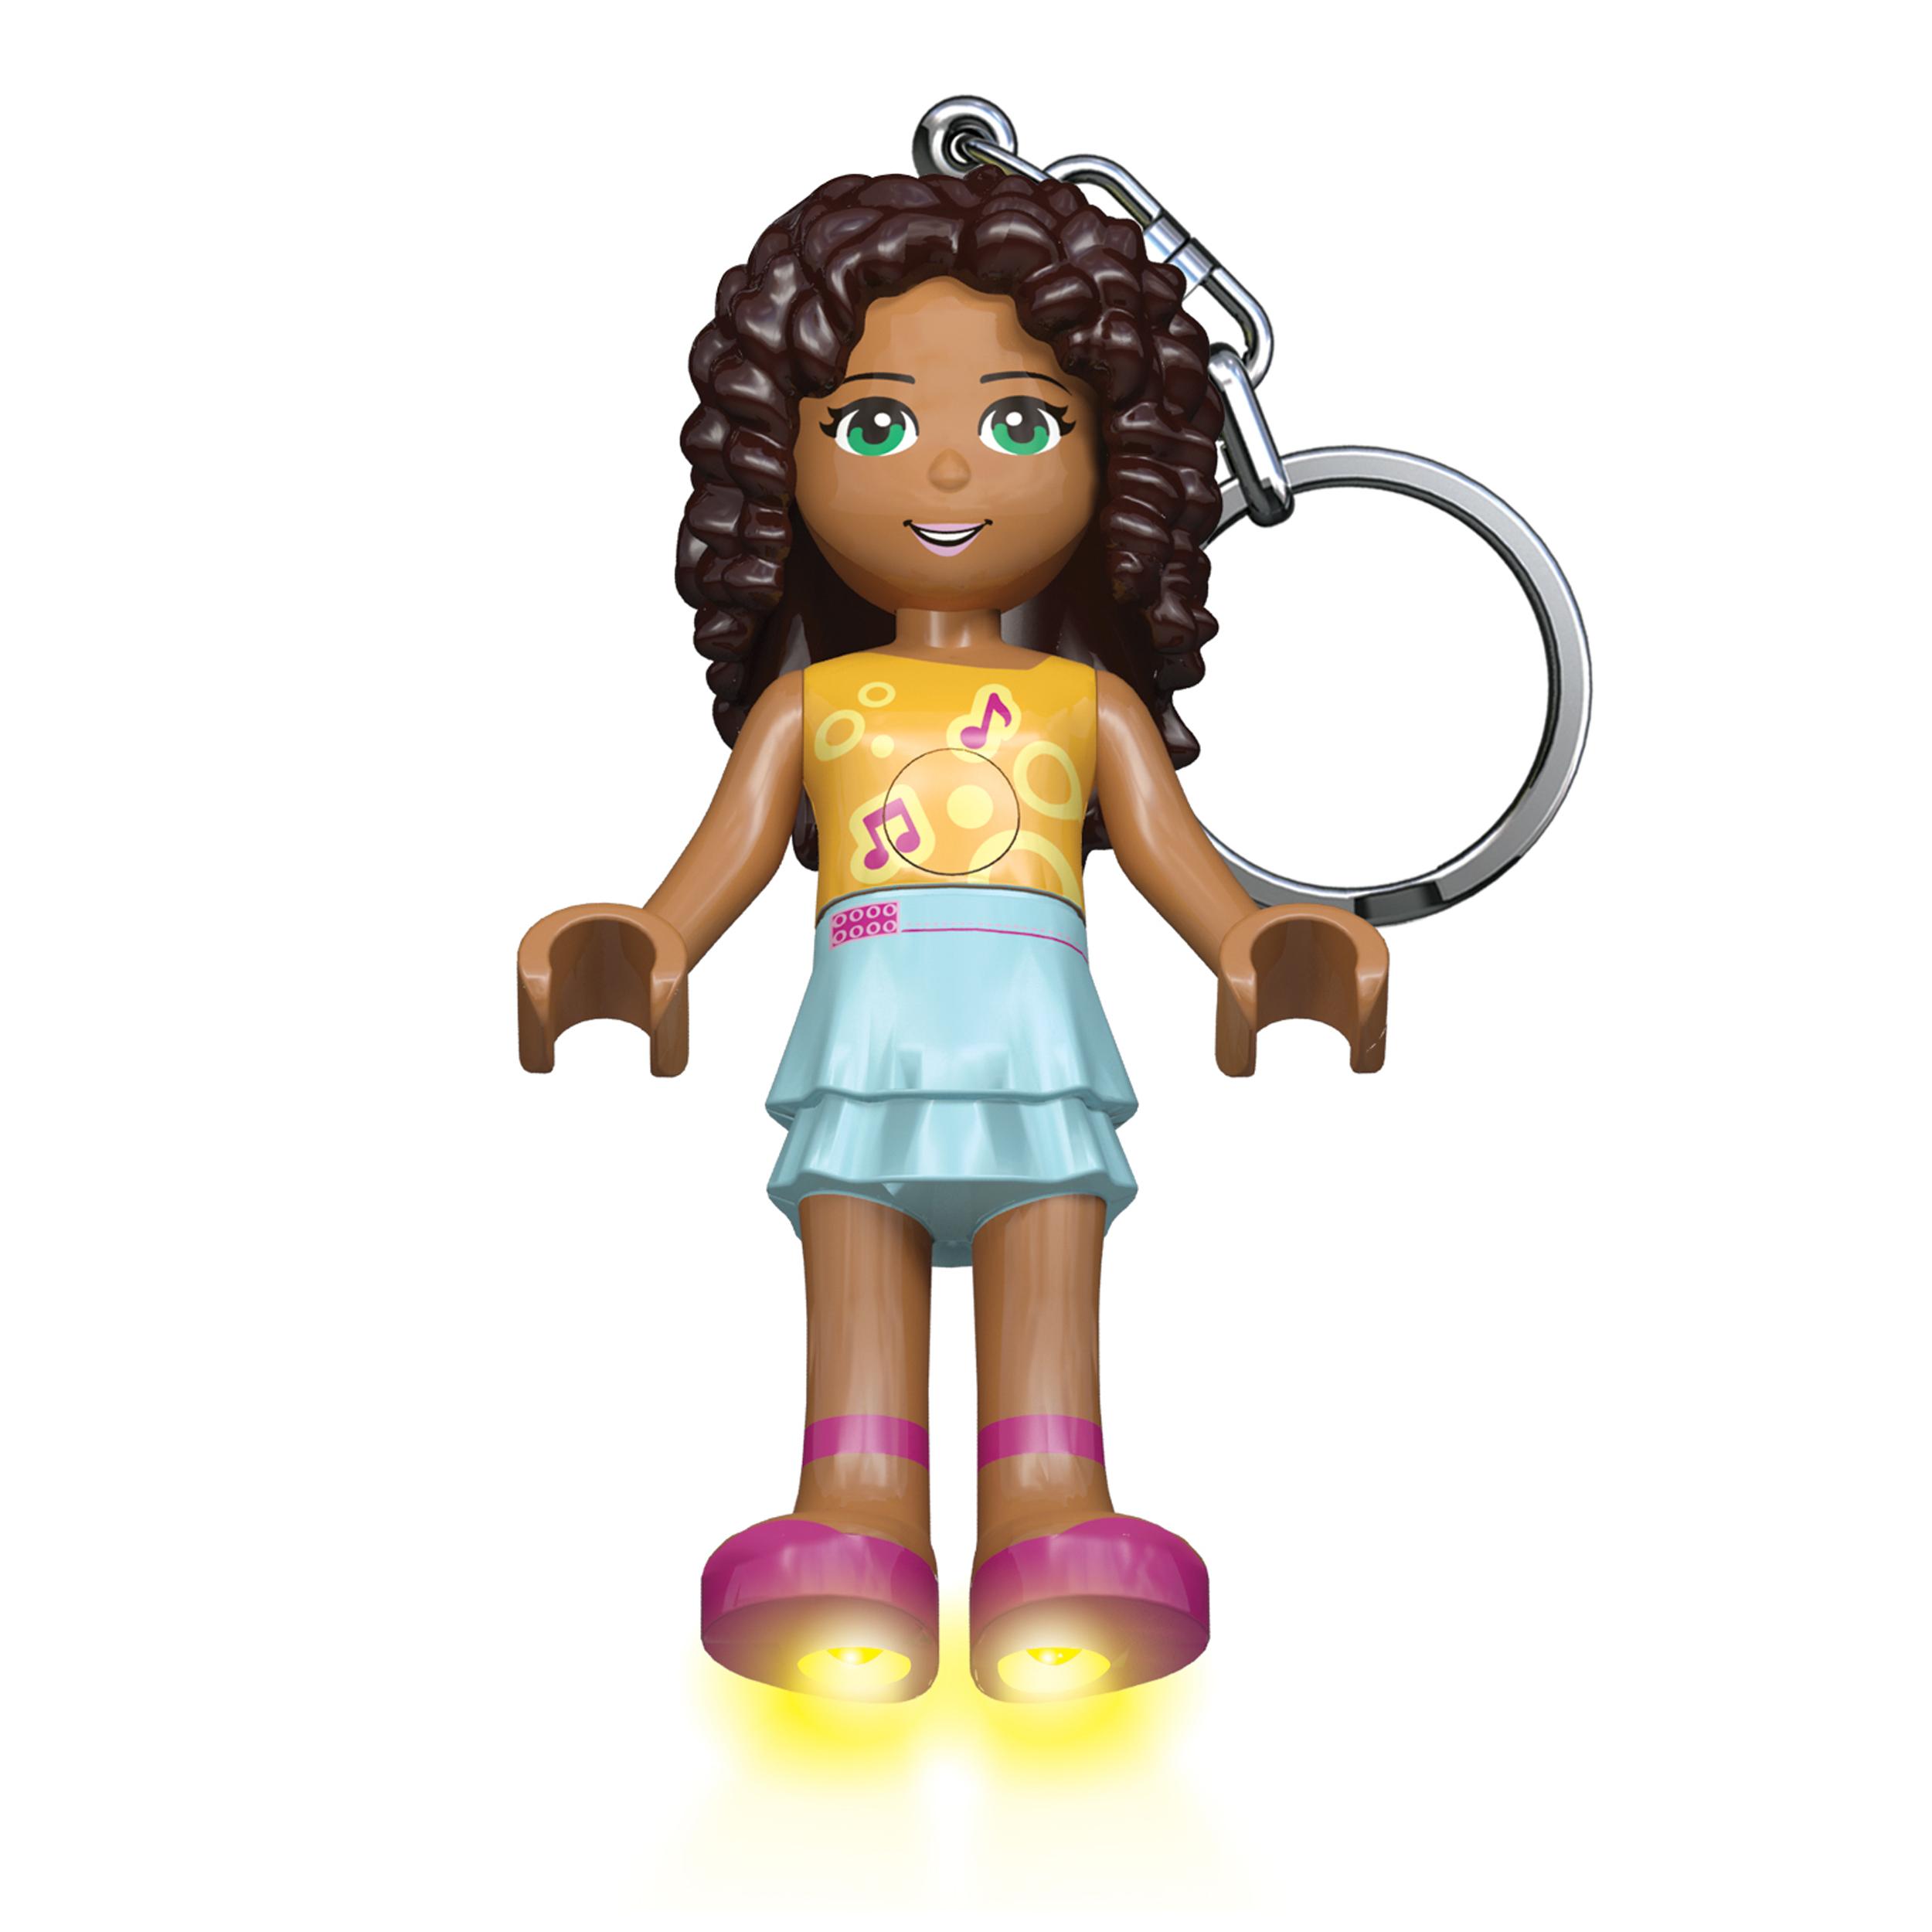 Lego Friends - Andrea